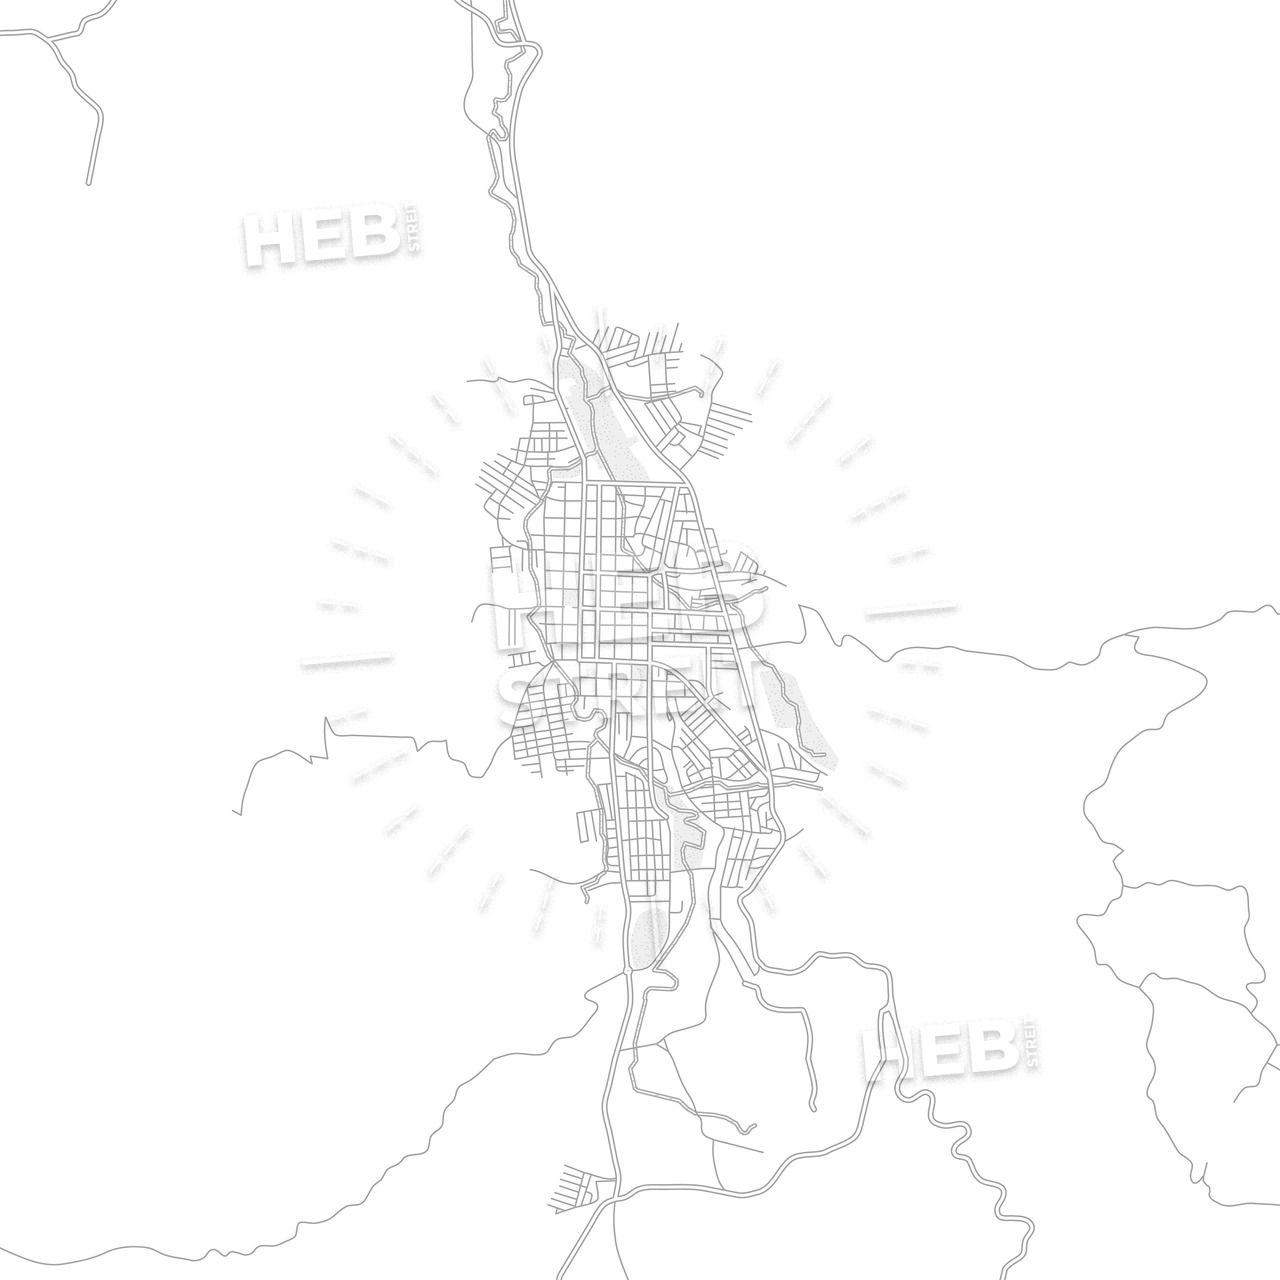 Jinotega, Jinotega, Nicaragua, bright outlined vector map ... on map of ocotal nicaragua, map of bluefields nicaragua, map of granada nicaragua, map of chinandega nicaragua, map of north america nicaragua, map of la concepcion nicaragua, map of matagalpa nicaragua, map of nueva guinea nicaragua, map of momotombo nicaragua, map of tola nicaragua, map of big corn island nicaragua, map of camoapa nicaragua, map of leon nicaragua, map of san rafael del sur nicaragua, map of corinto nicaragua, map of waslala nicaragua, map of diriamba nicaragua, map of managua nicaragua, map of nandaime nicaragua, map of pearl lagoon nicaragua,